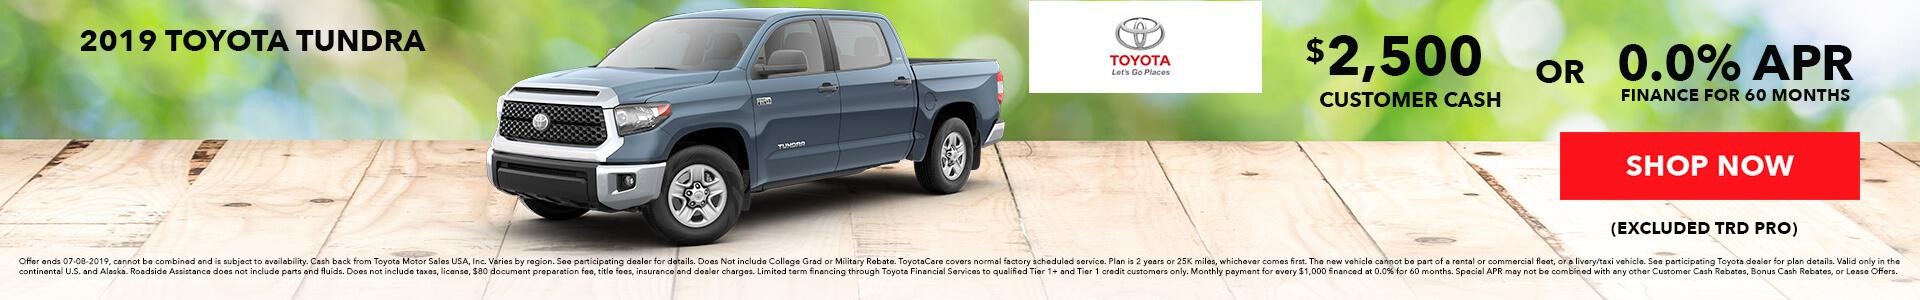 Toyota Tundra $2500 Customer Cash